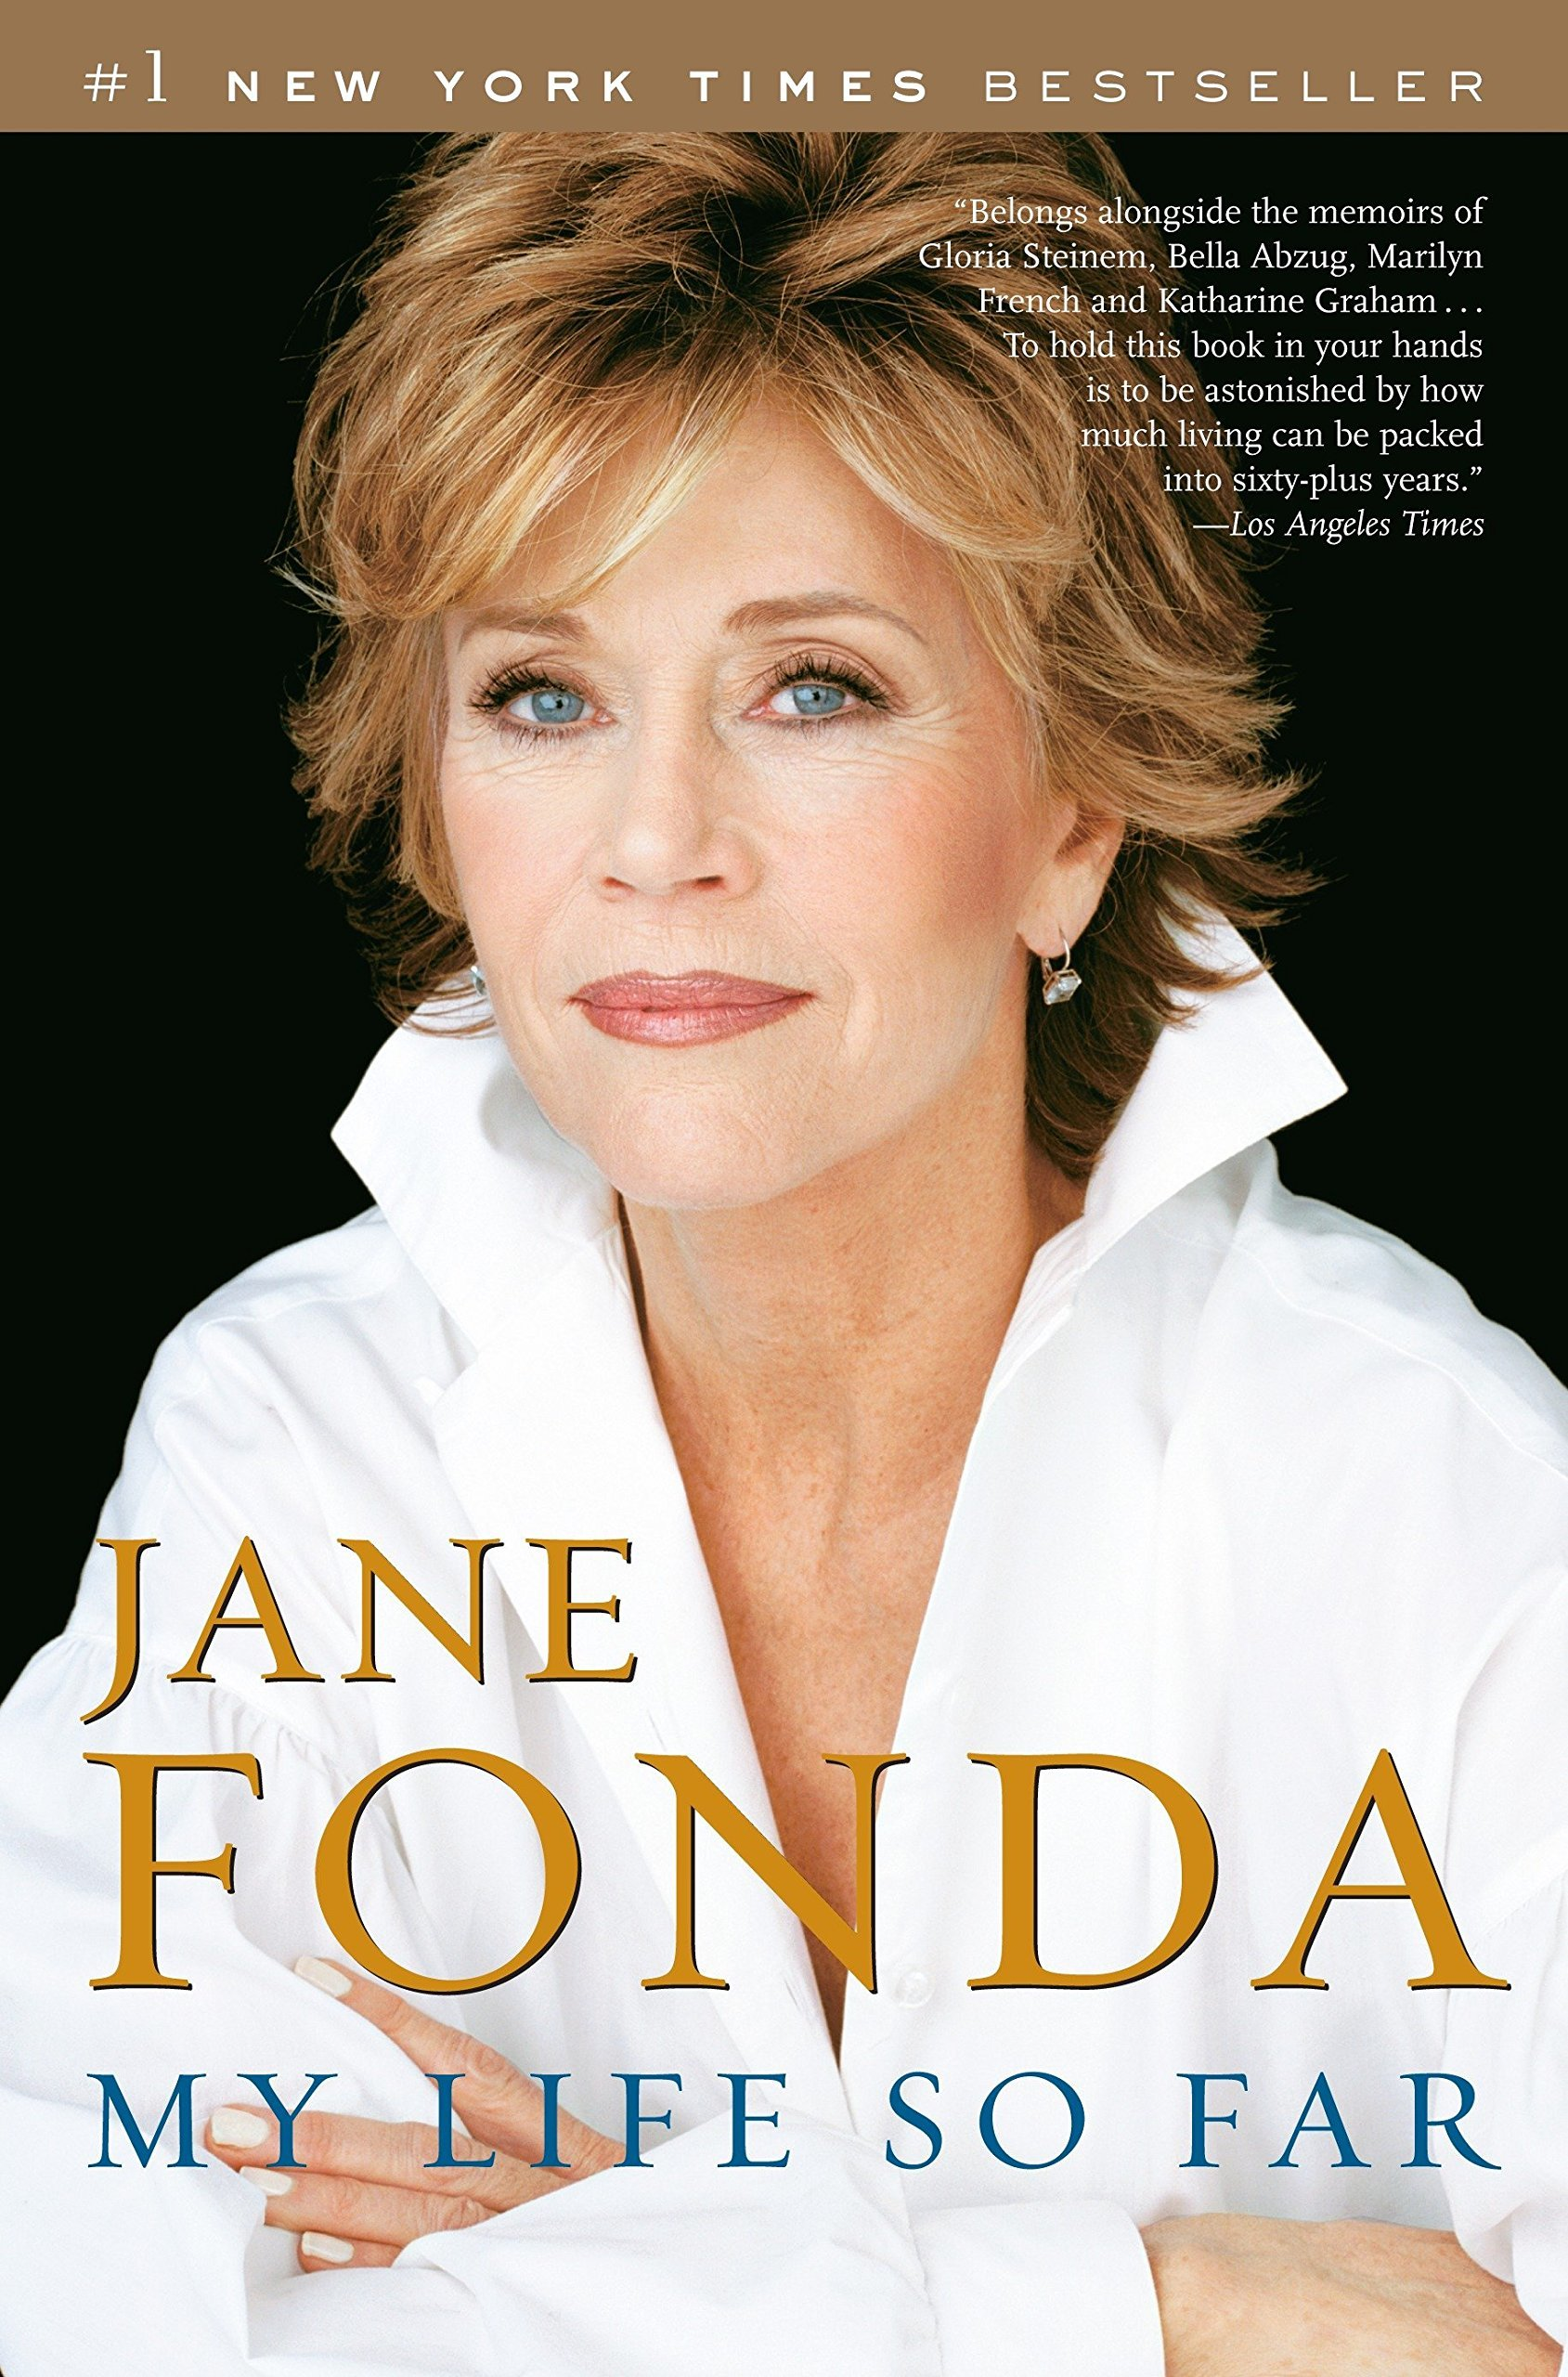 """My life so far"", la autobiografía escrita por Jane Fonda."